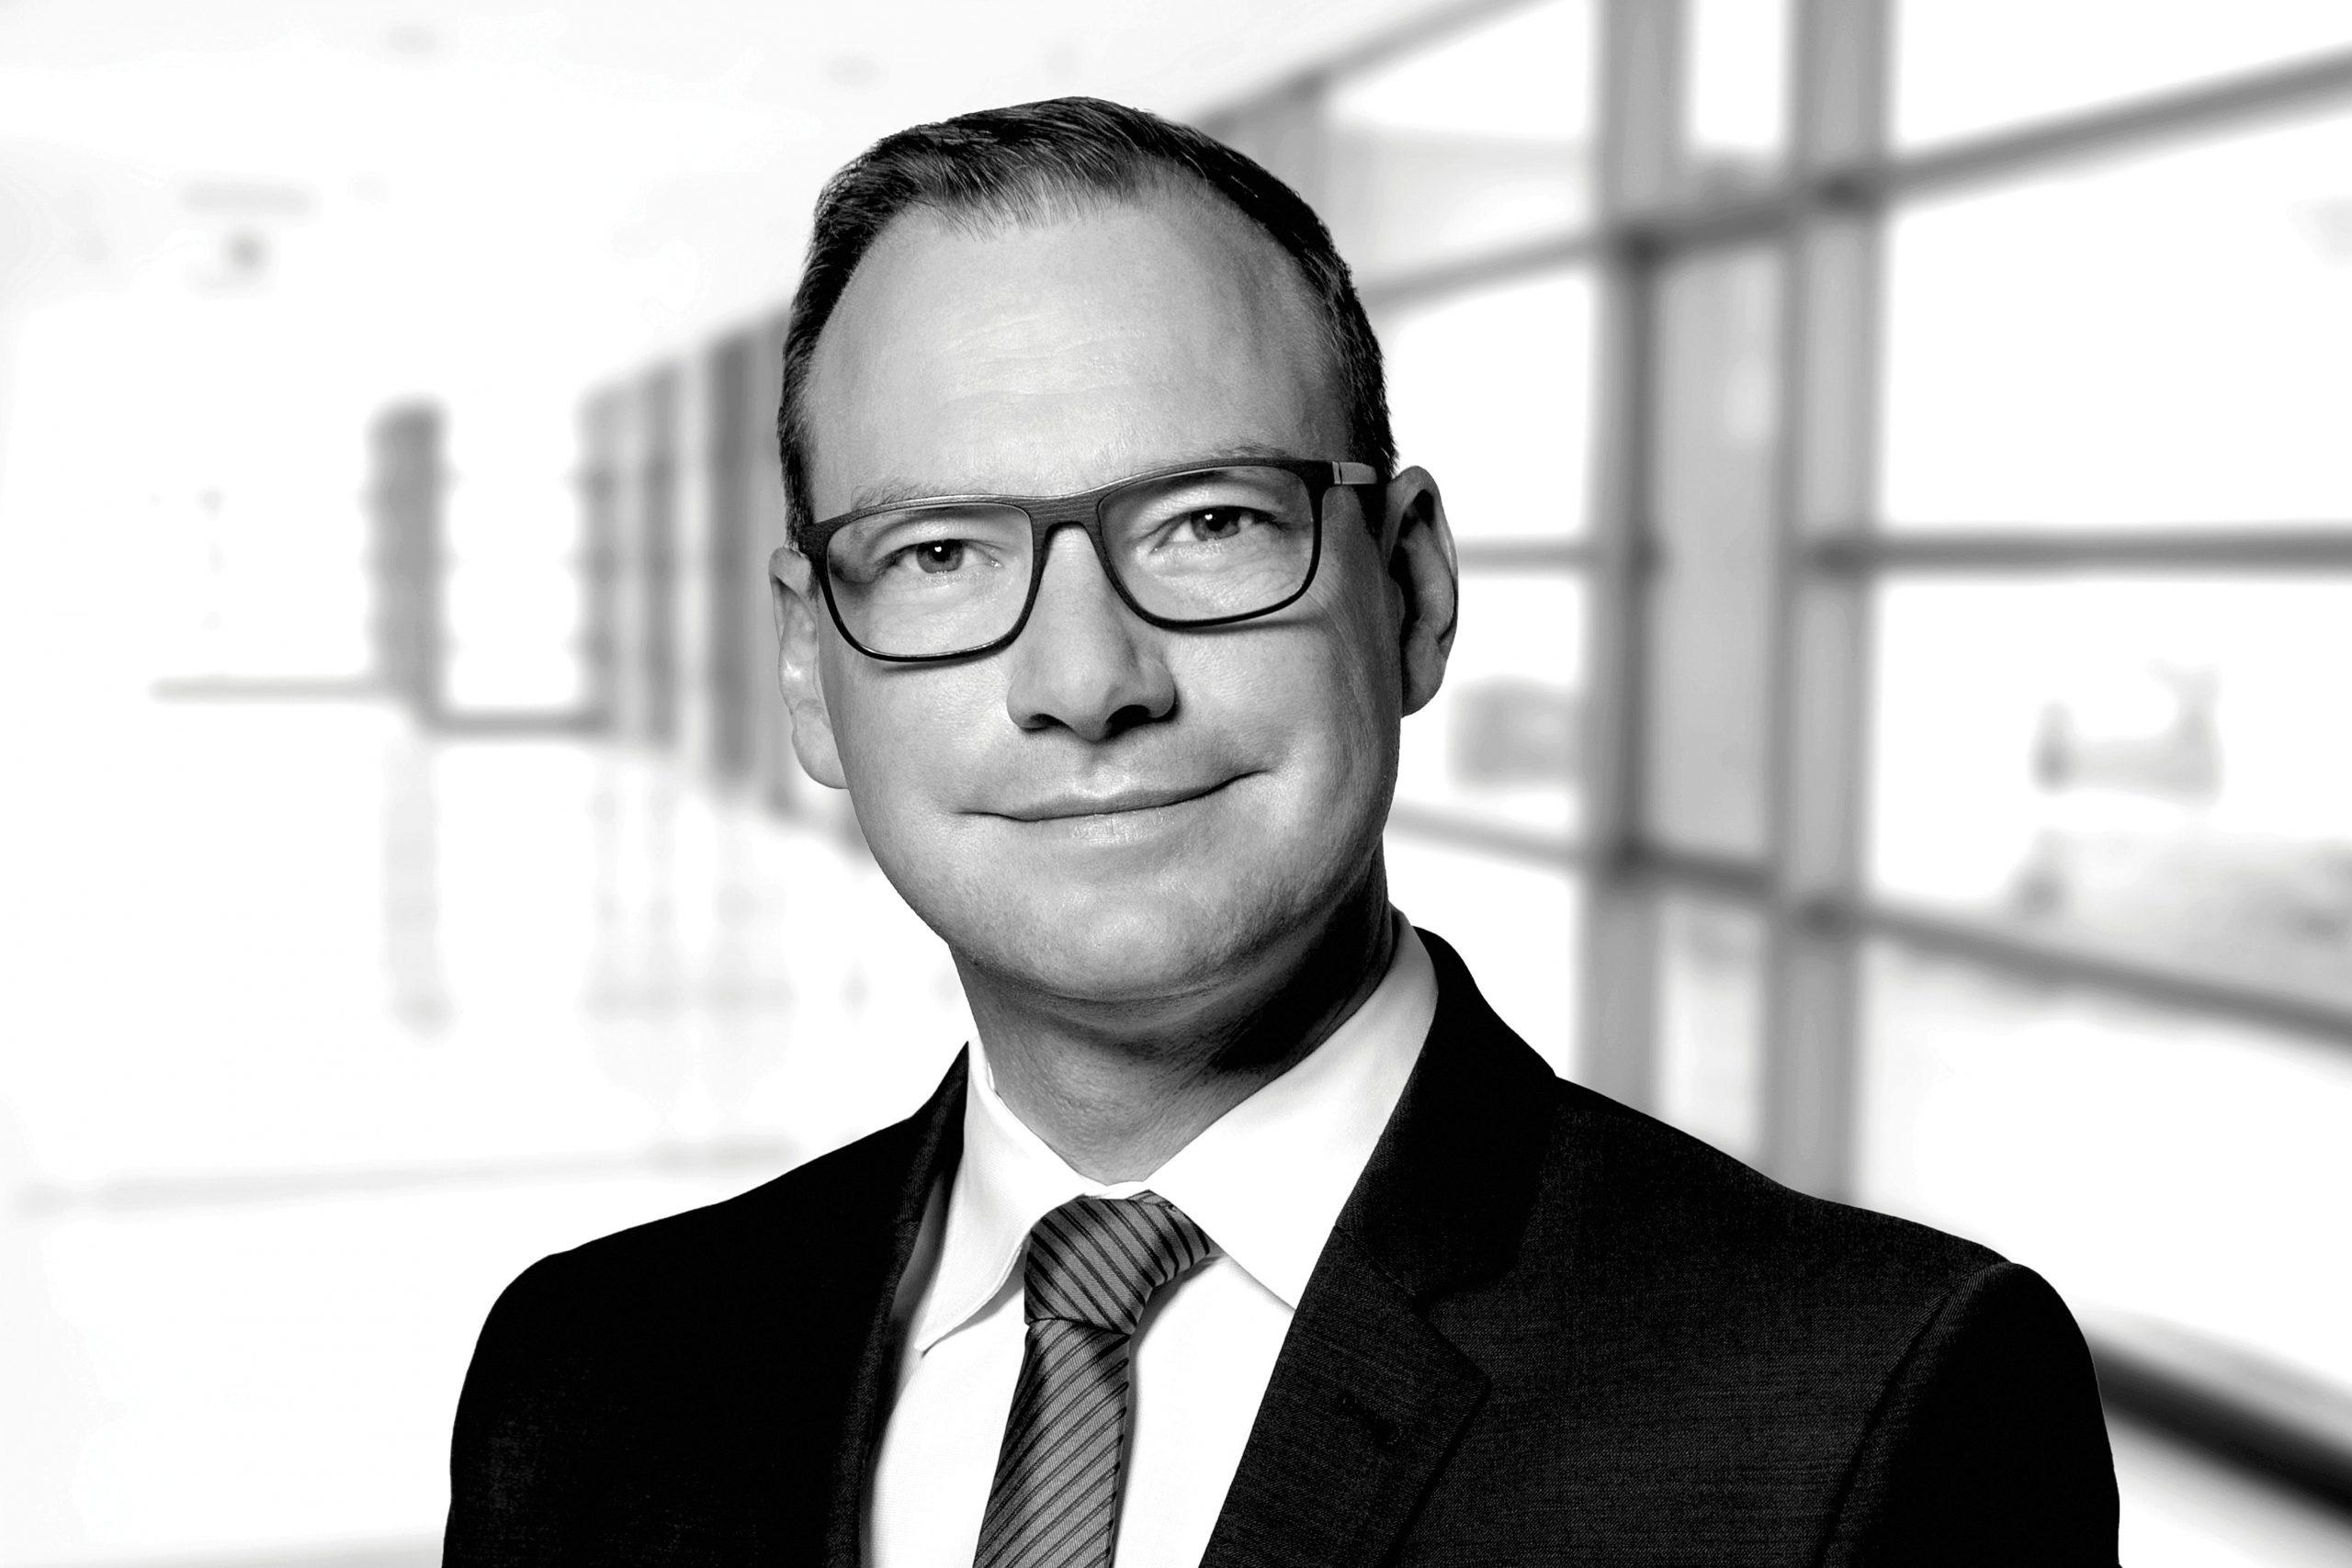 Andre Waßmann